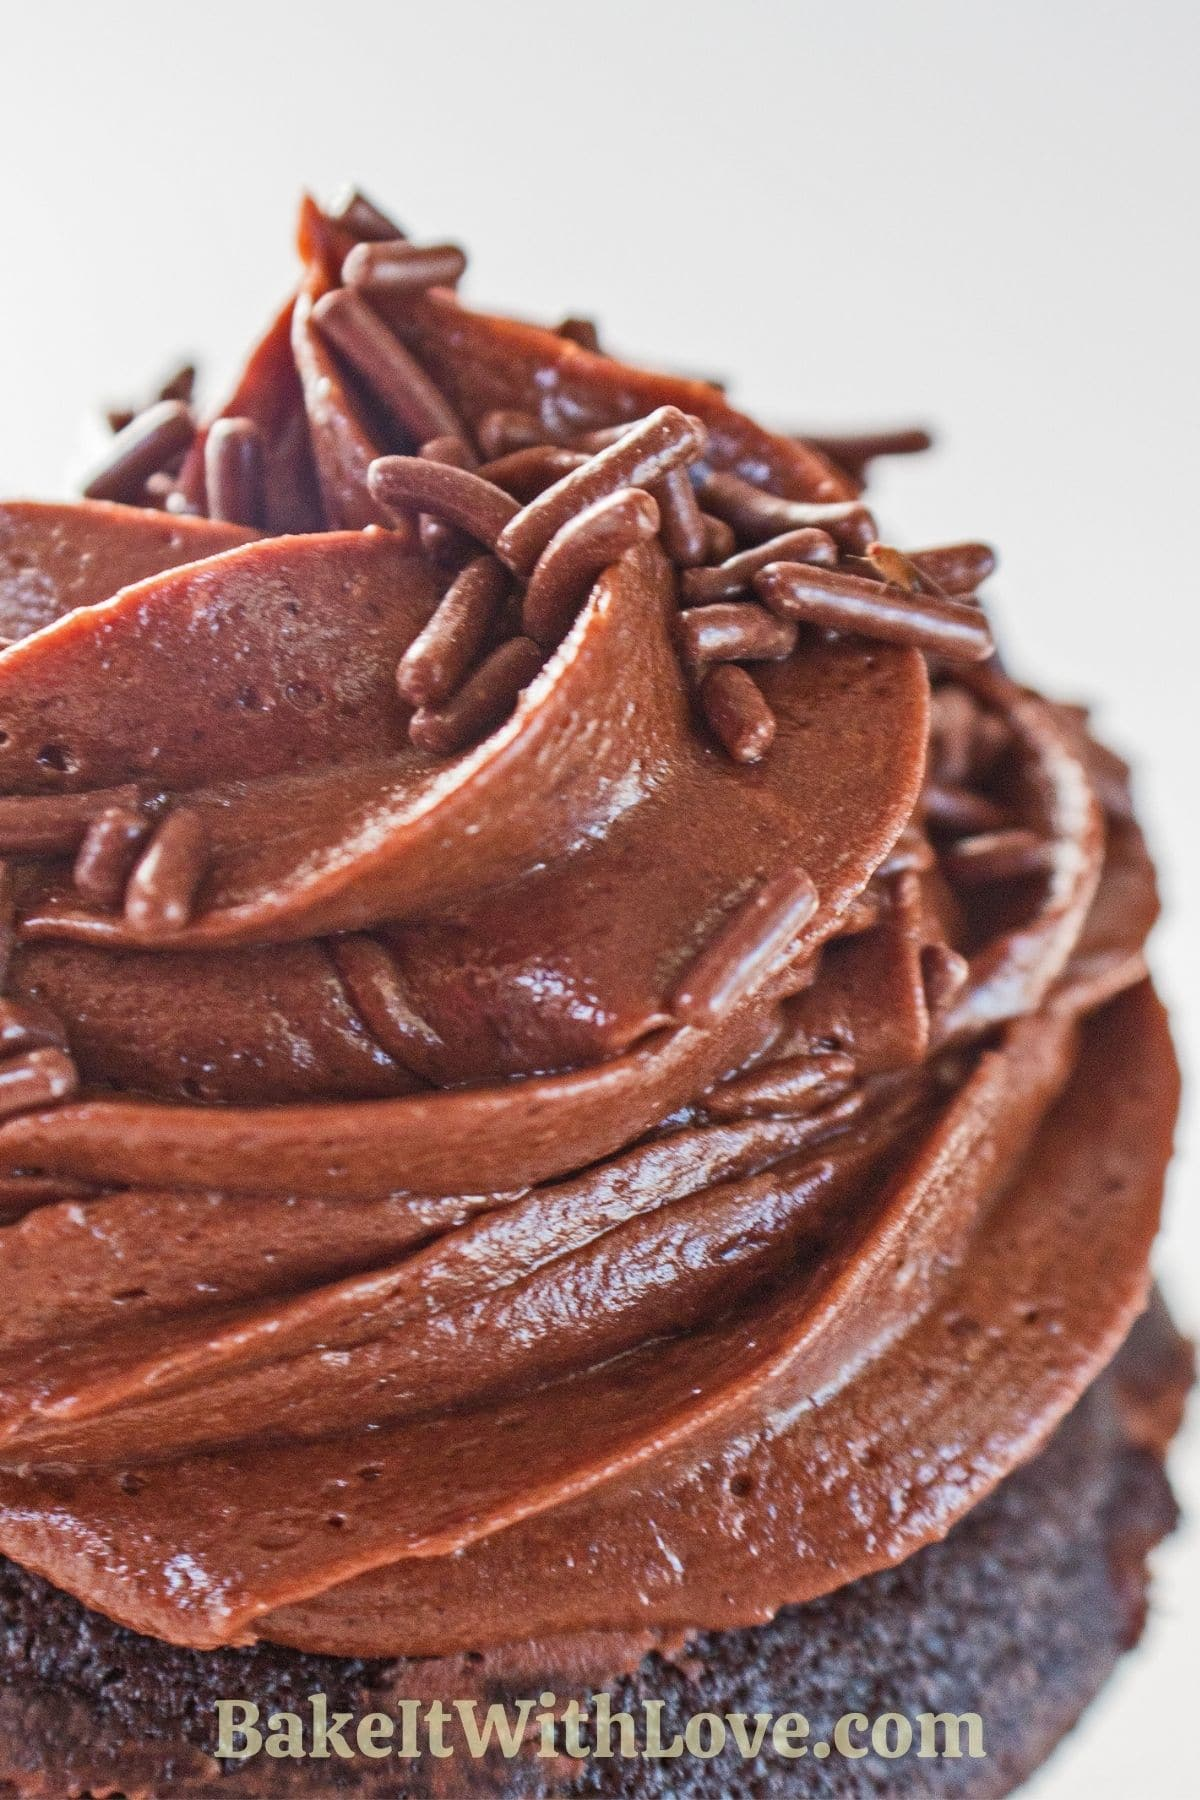 Gambar tinggi closeup frosting buttercream cokelat.